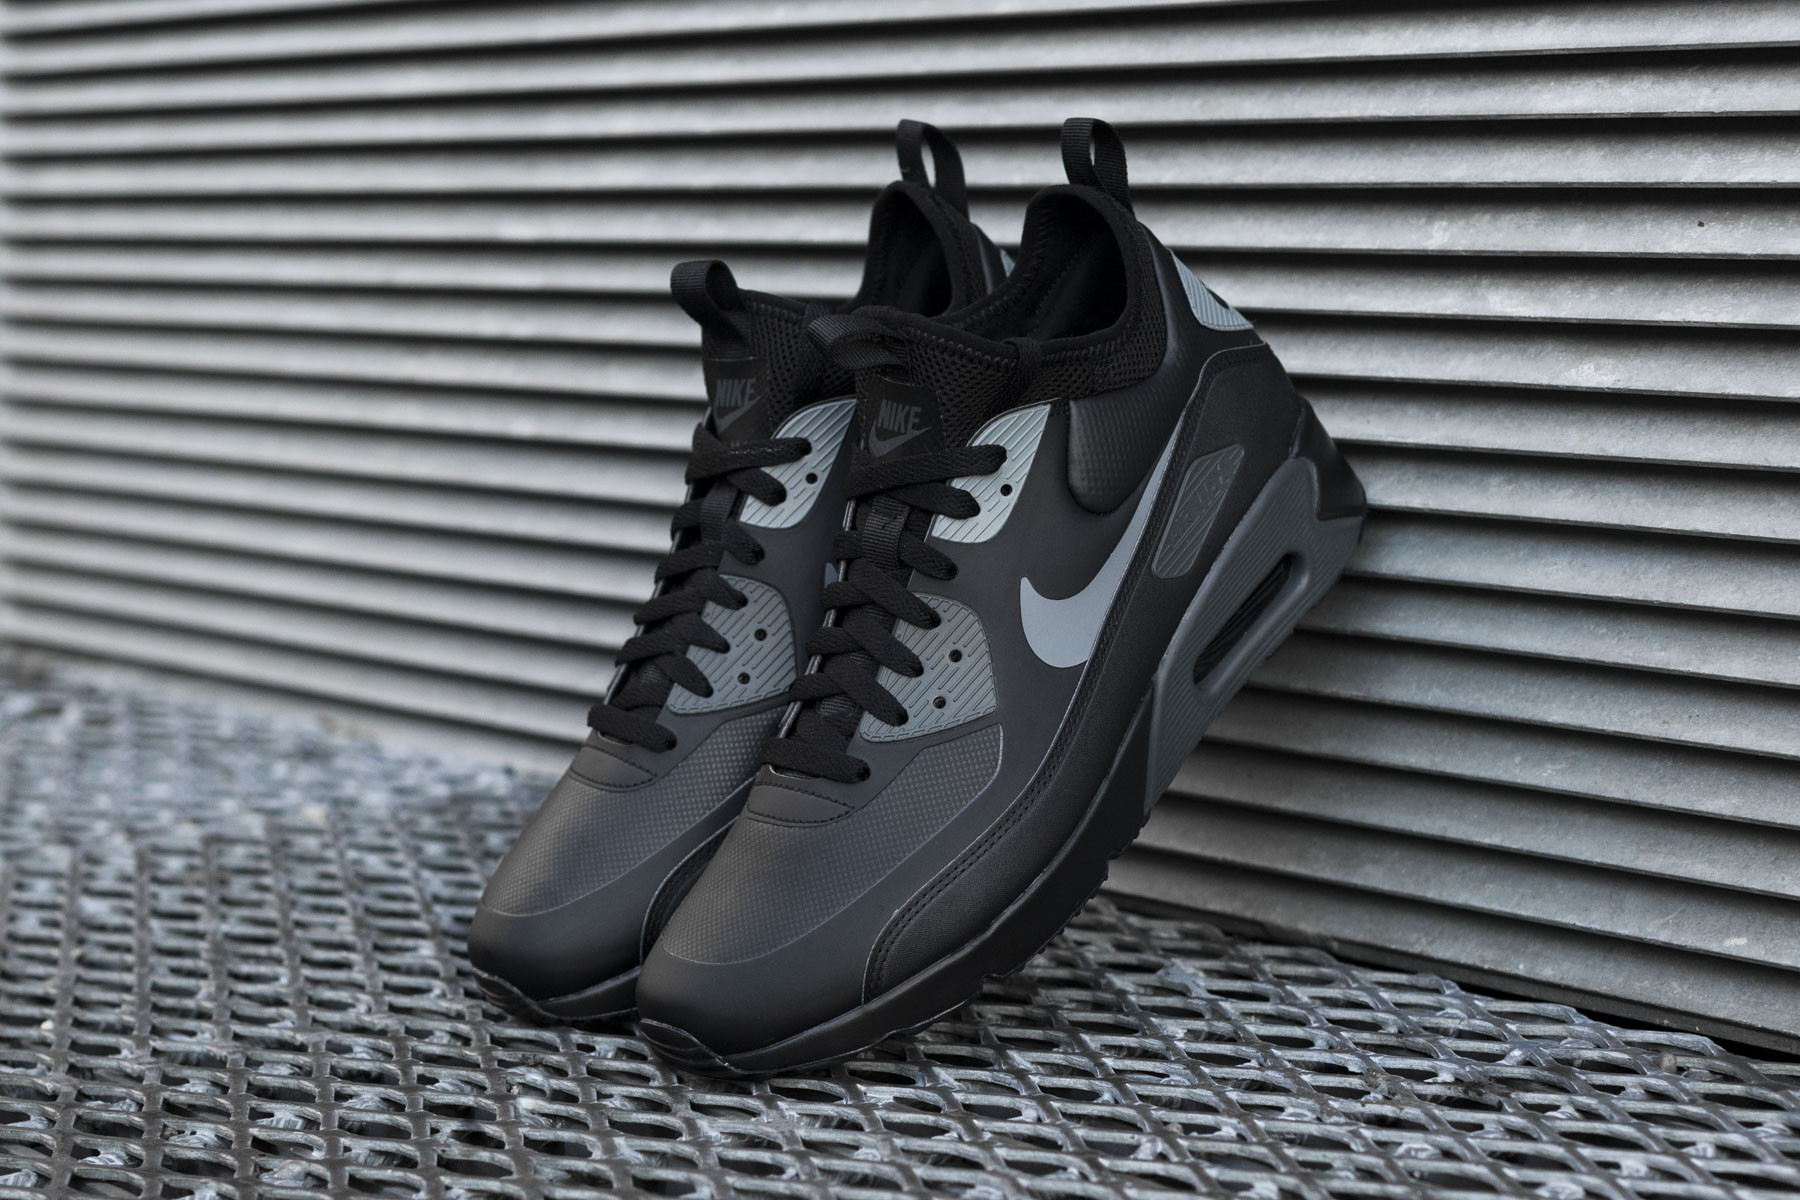 reputable site 46b3a 04440 Nike Air Max 90 Ultra Mid Winter